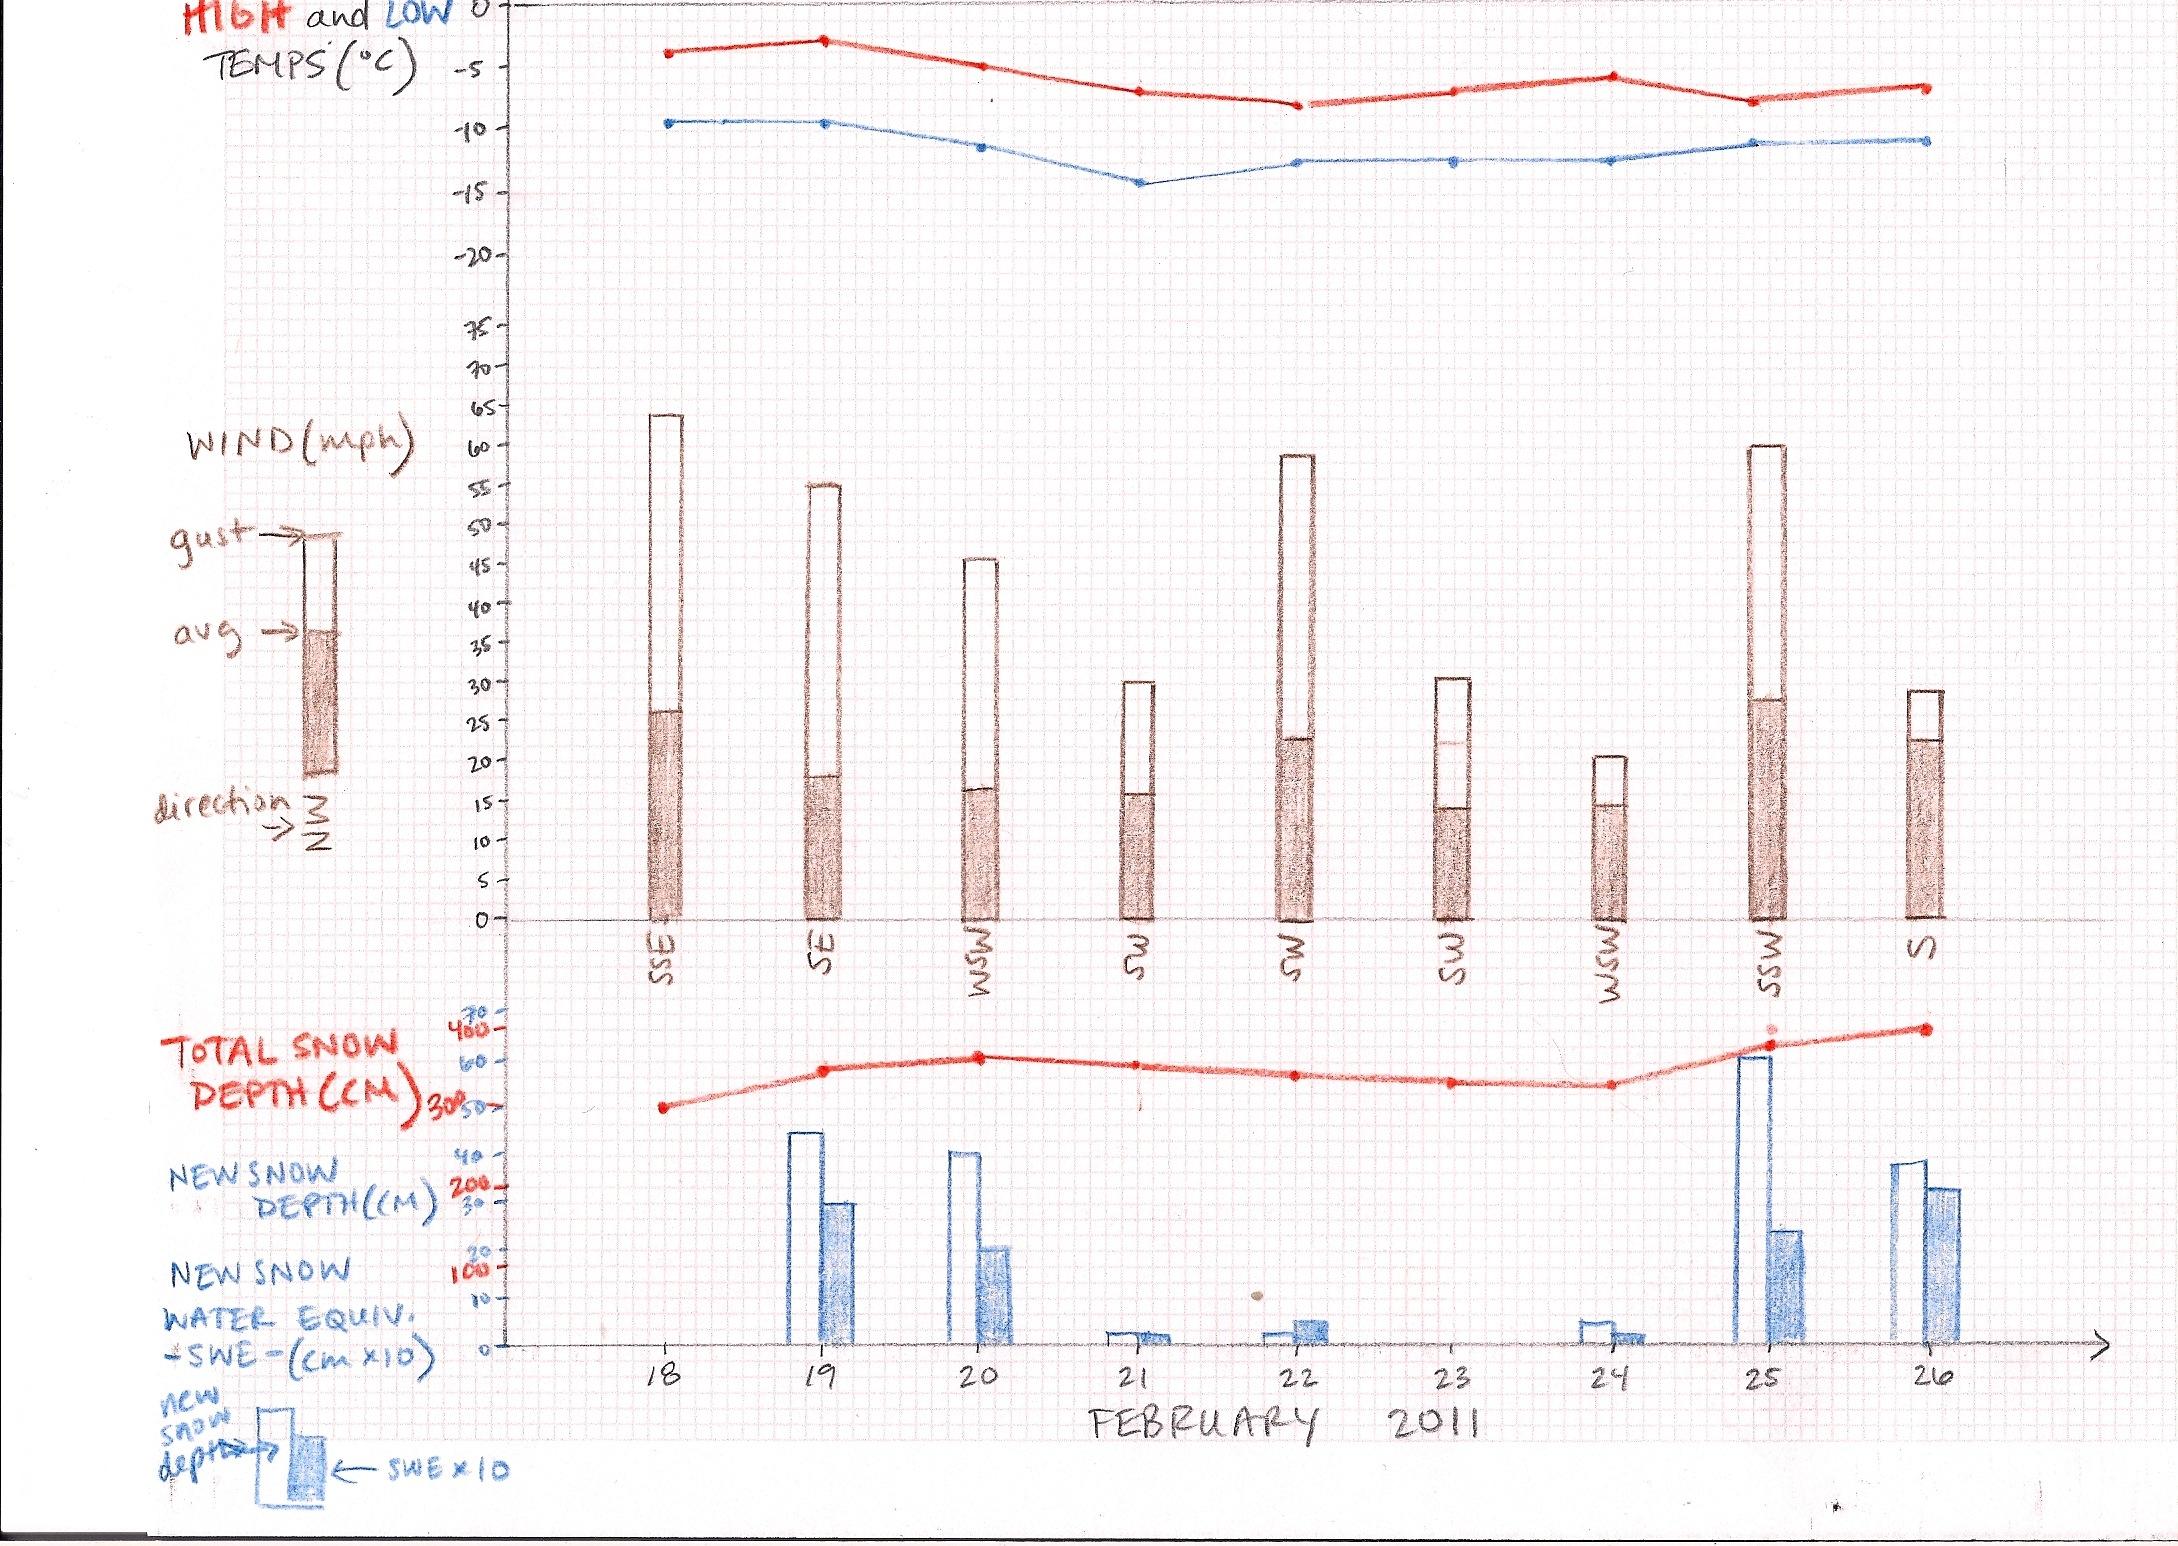 Blank Timeline Worksheet Sample week-long timeline from